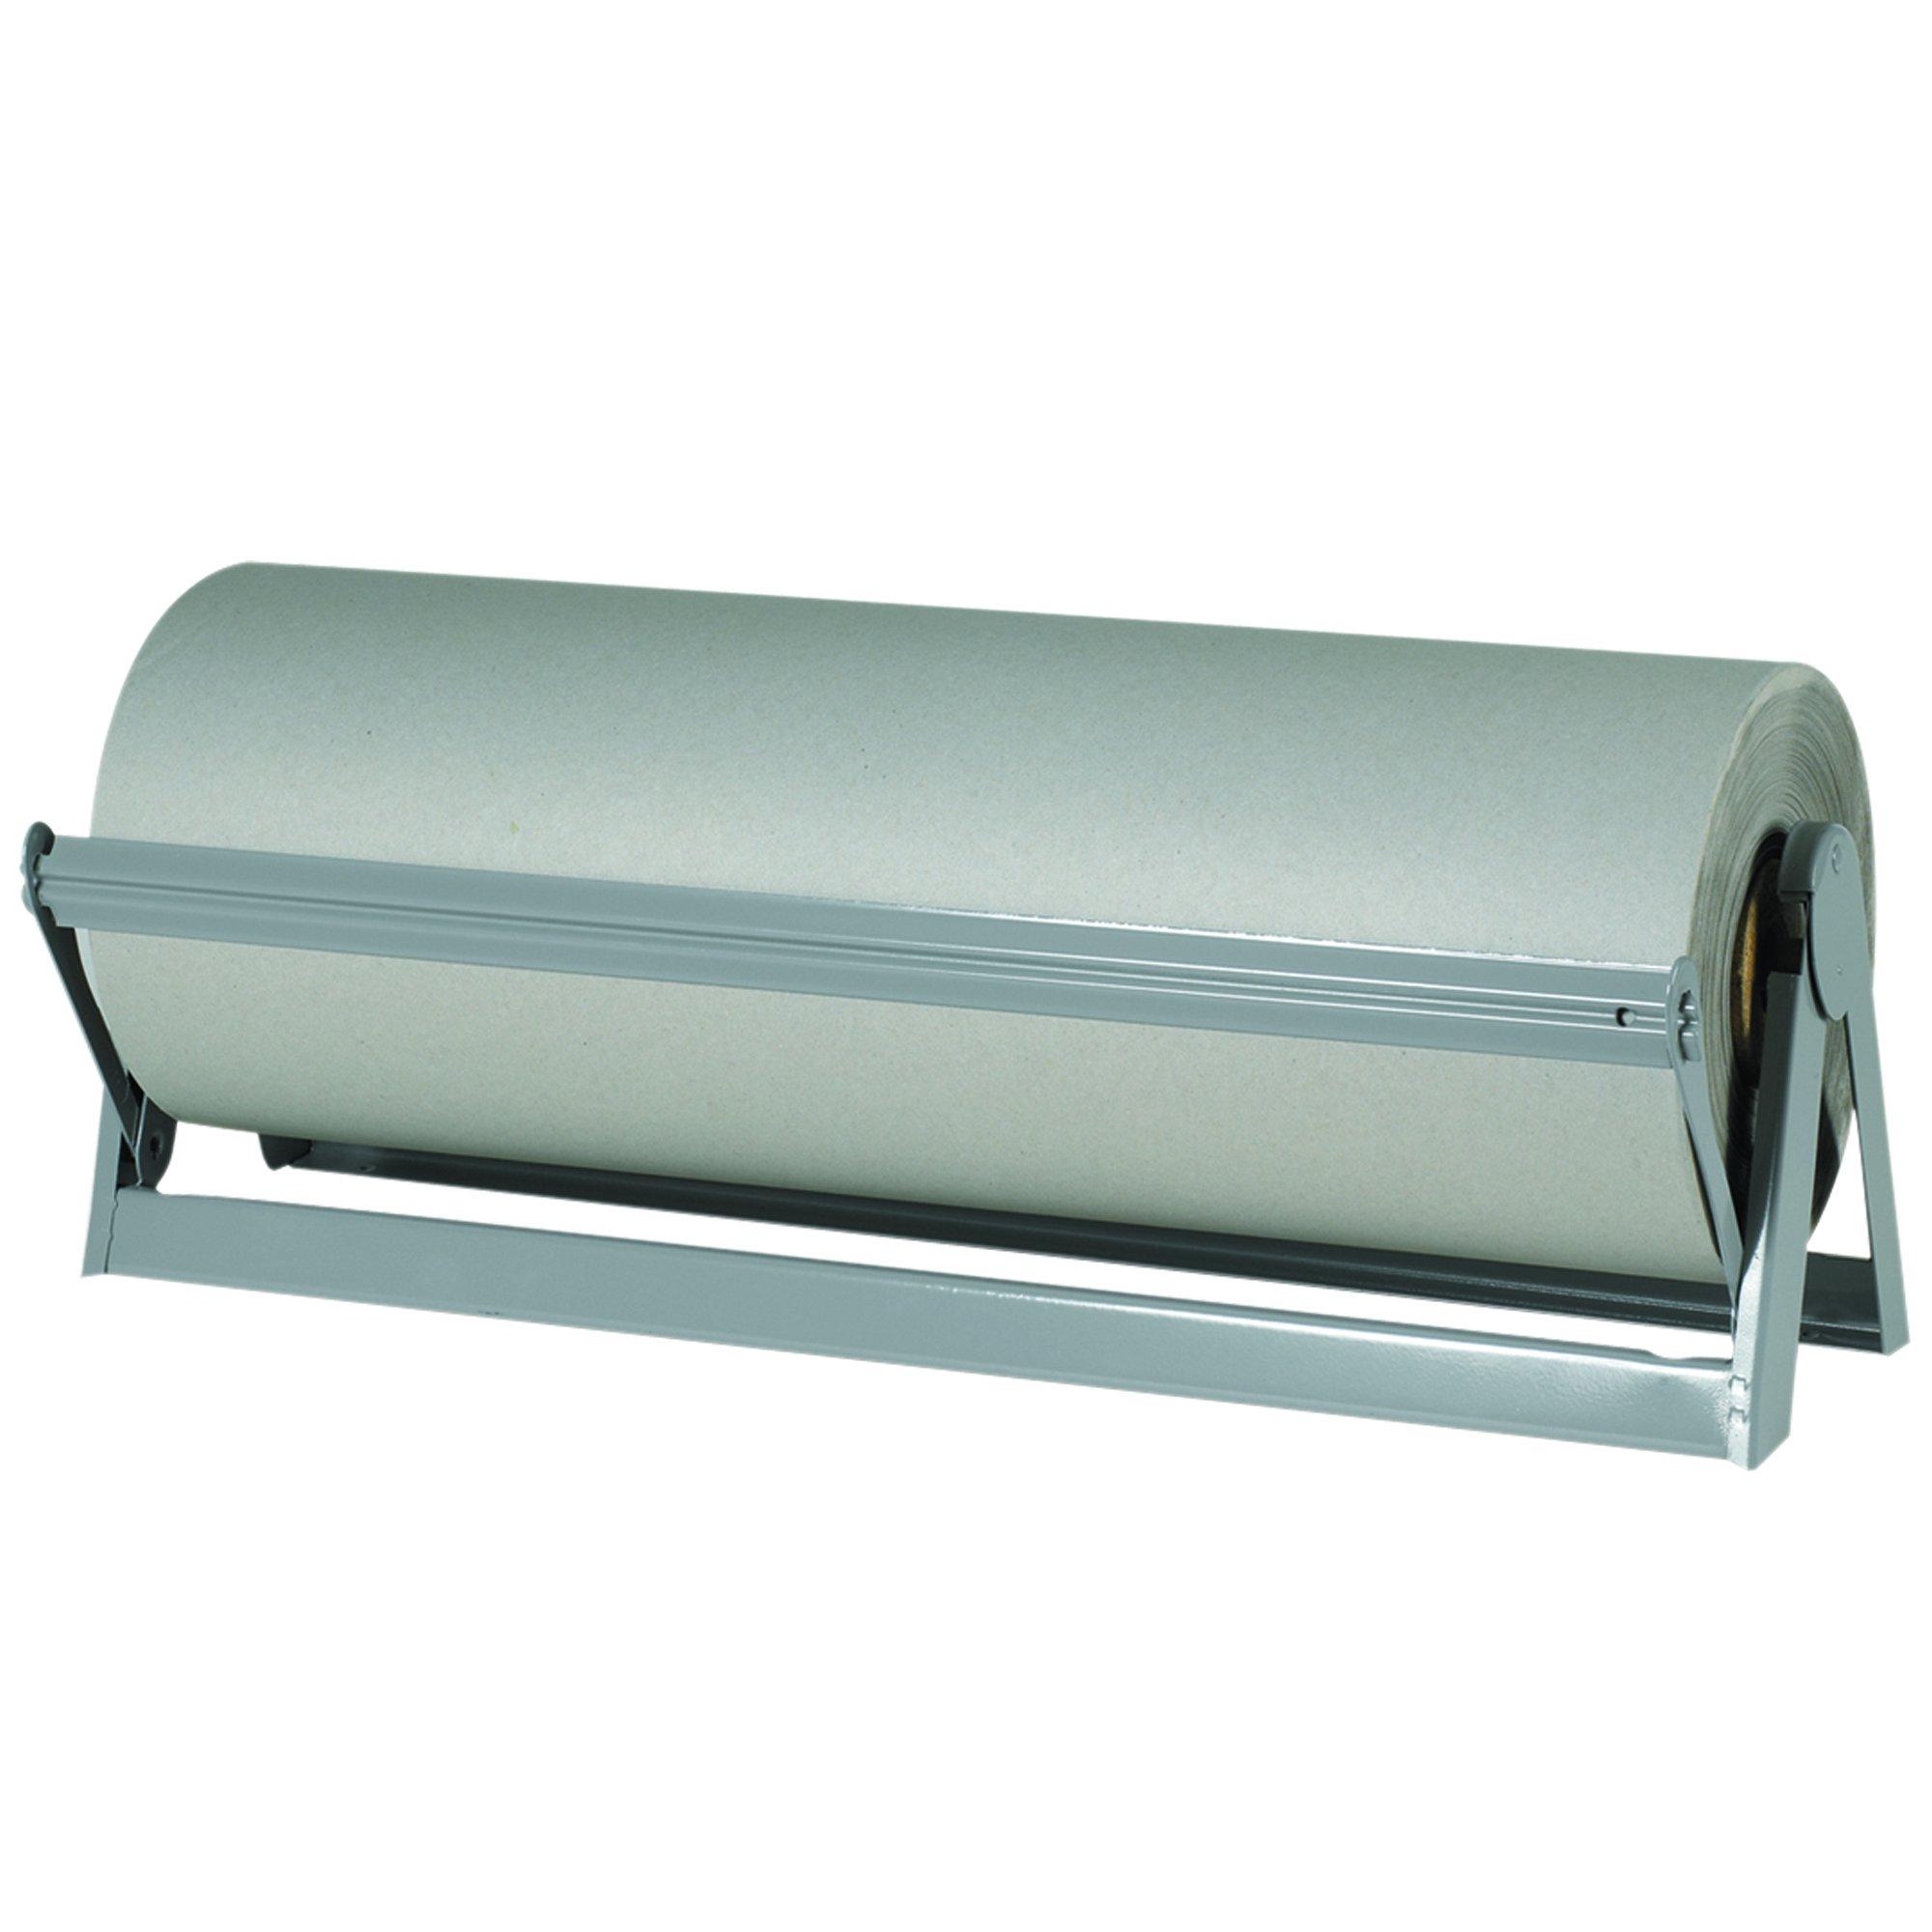 Partners Brand PKPB1850 Bogus Kraft Paper Roll, 50#, 18'' x 720', Gray by Partners Brand